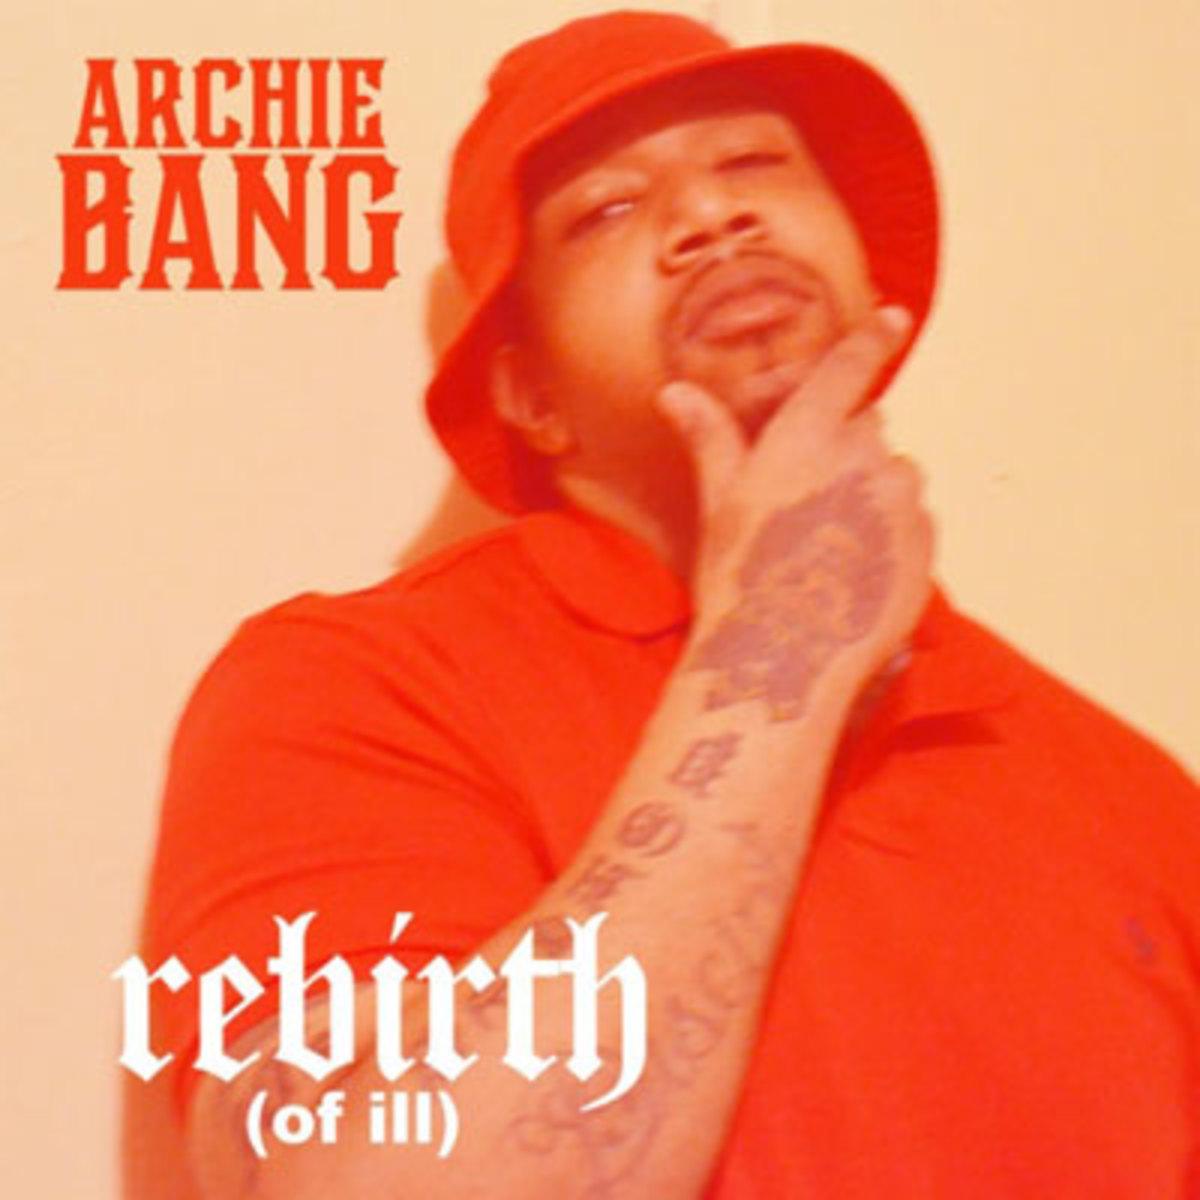 archiebang-rebirthofill.jpg